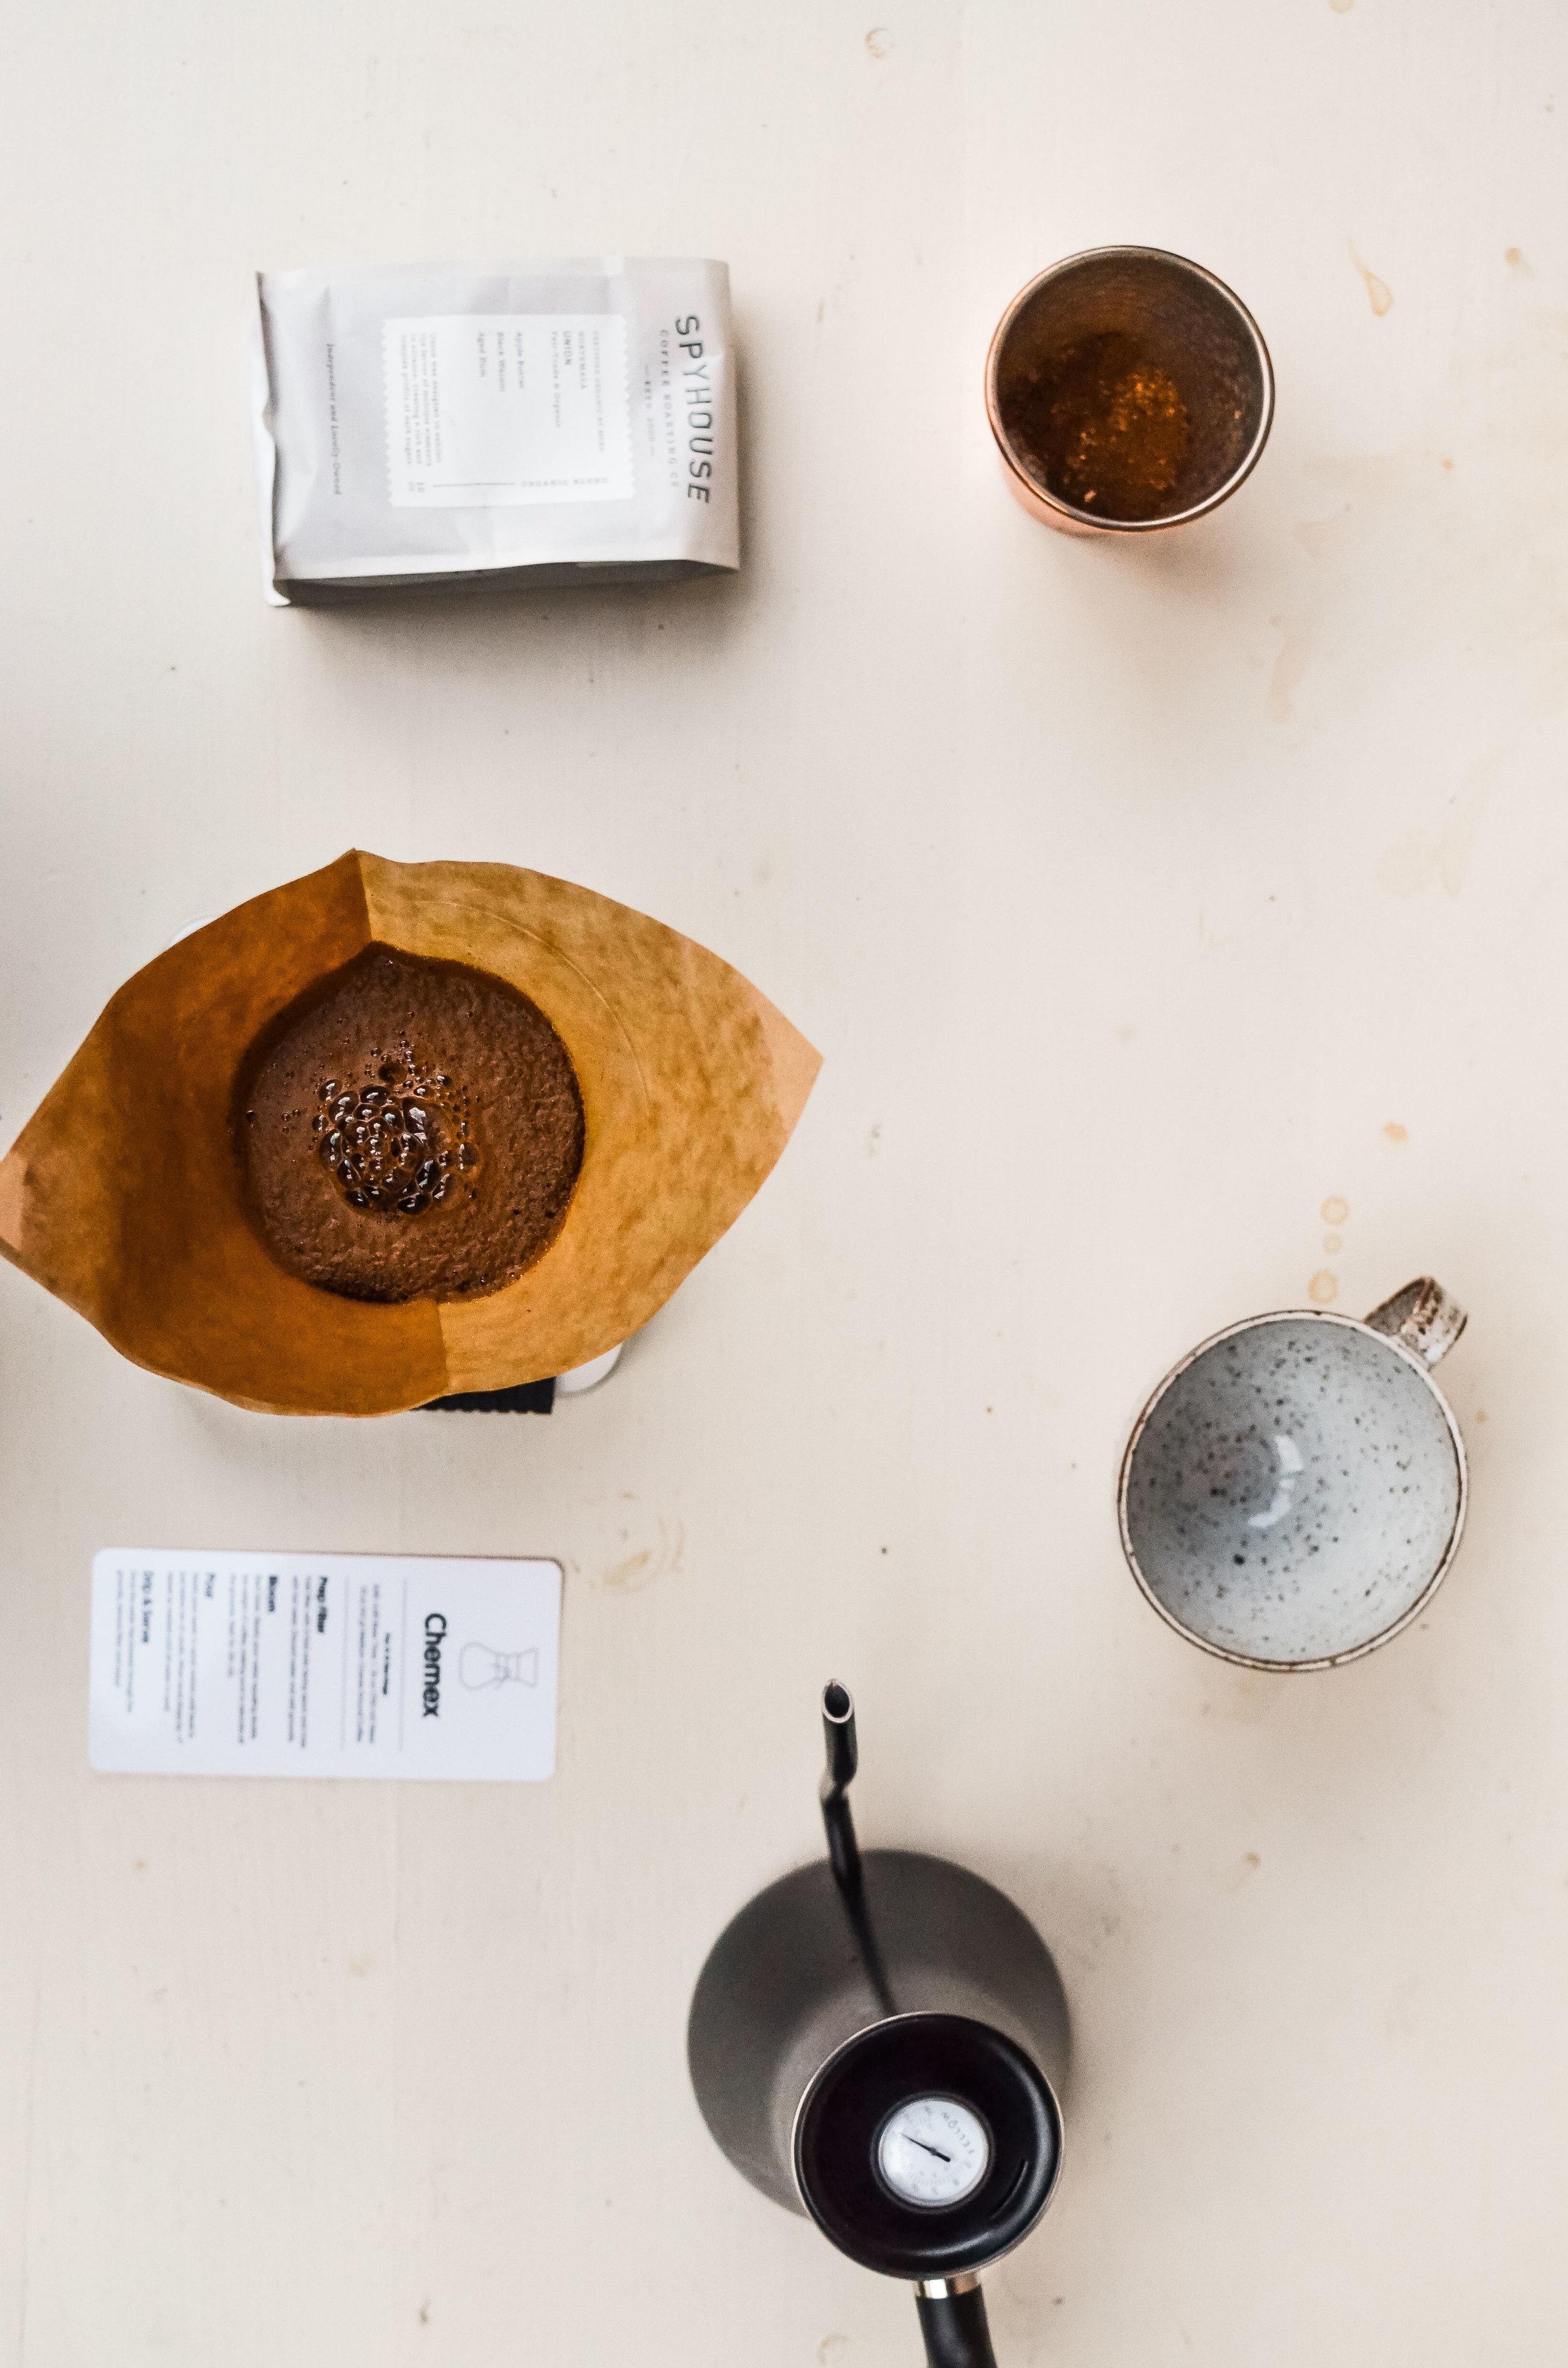 Wendling_Boyd_Trade_Coffee_Co_Spyhouse_Coffee-11.jpg